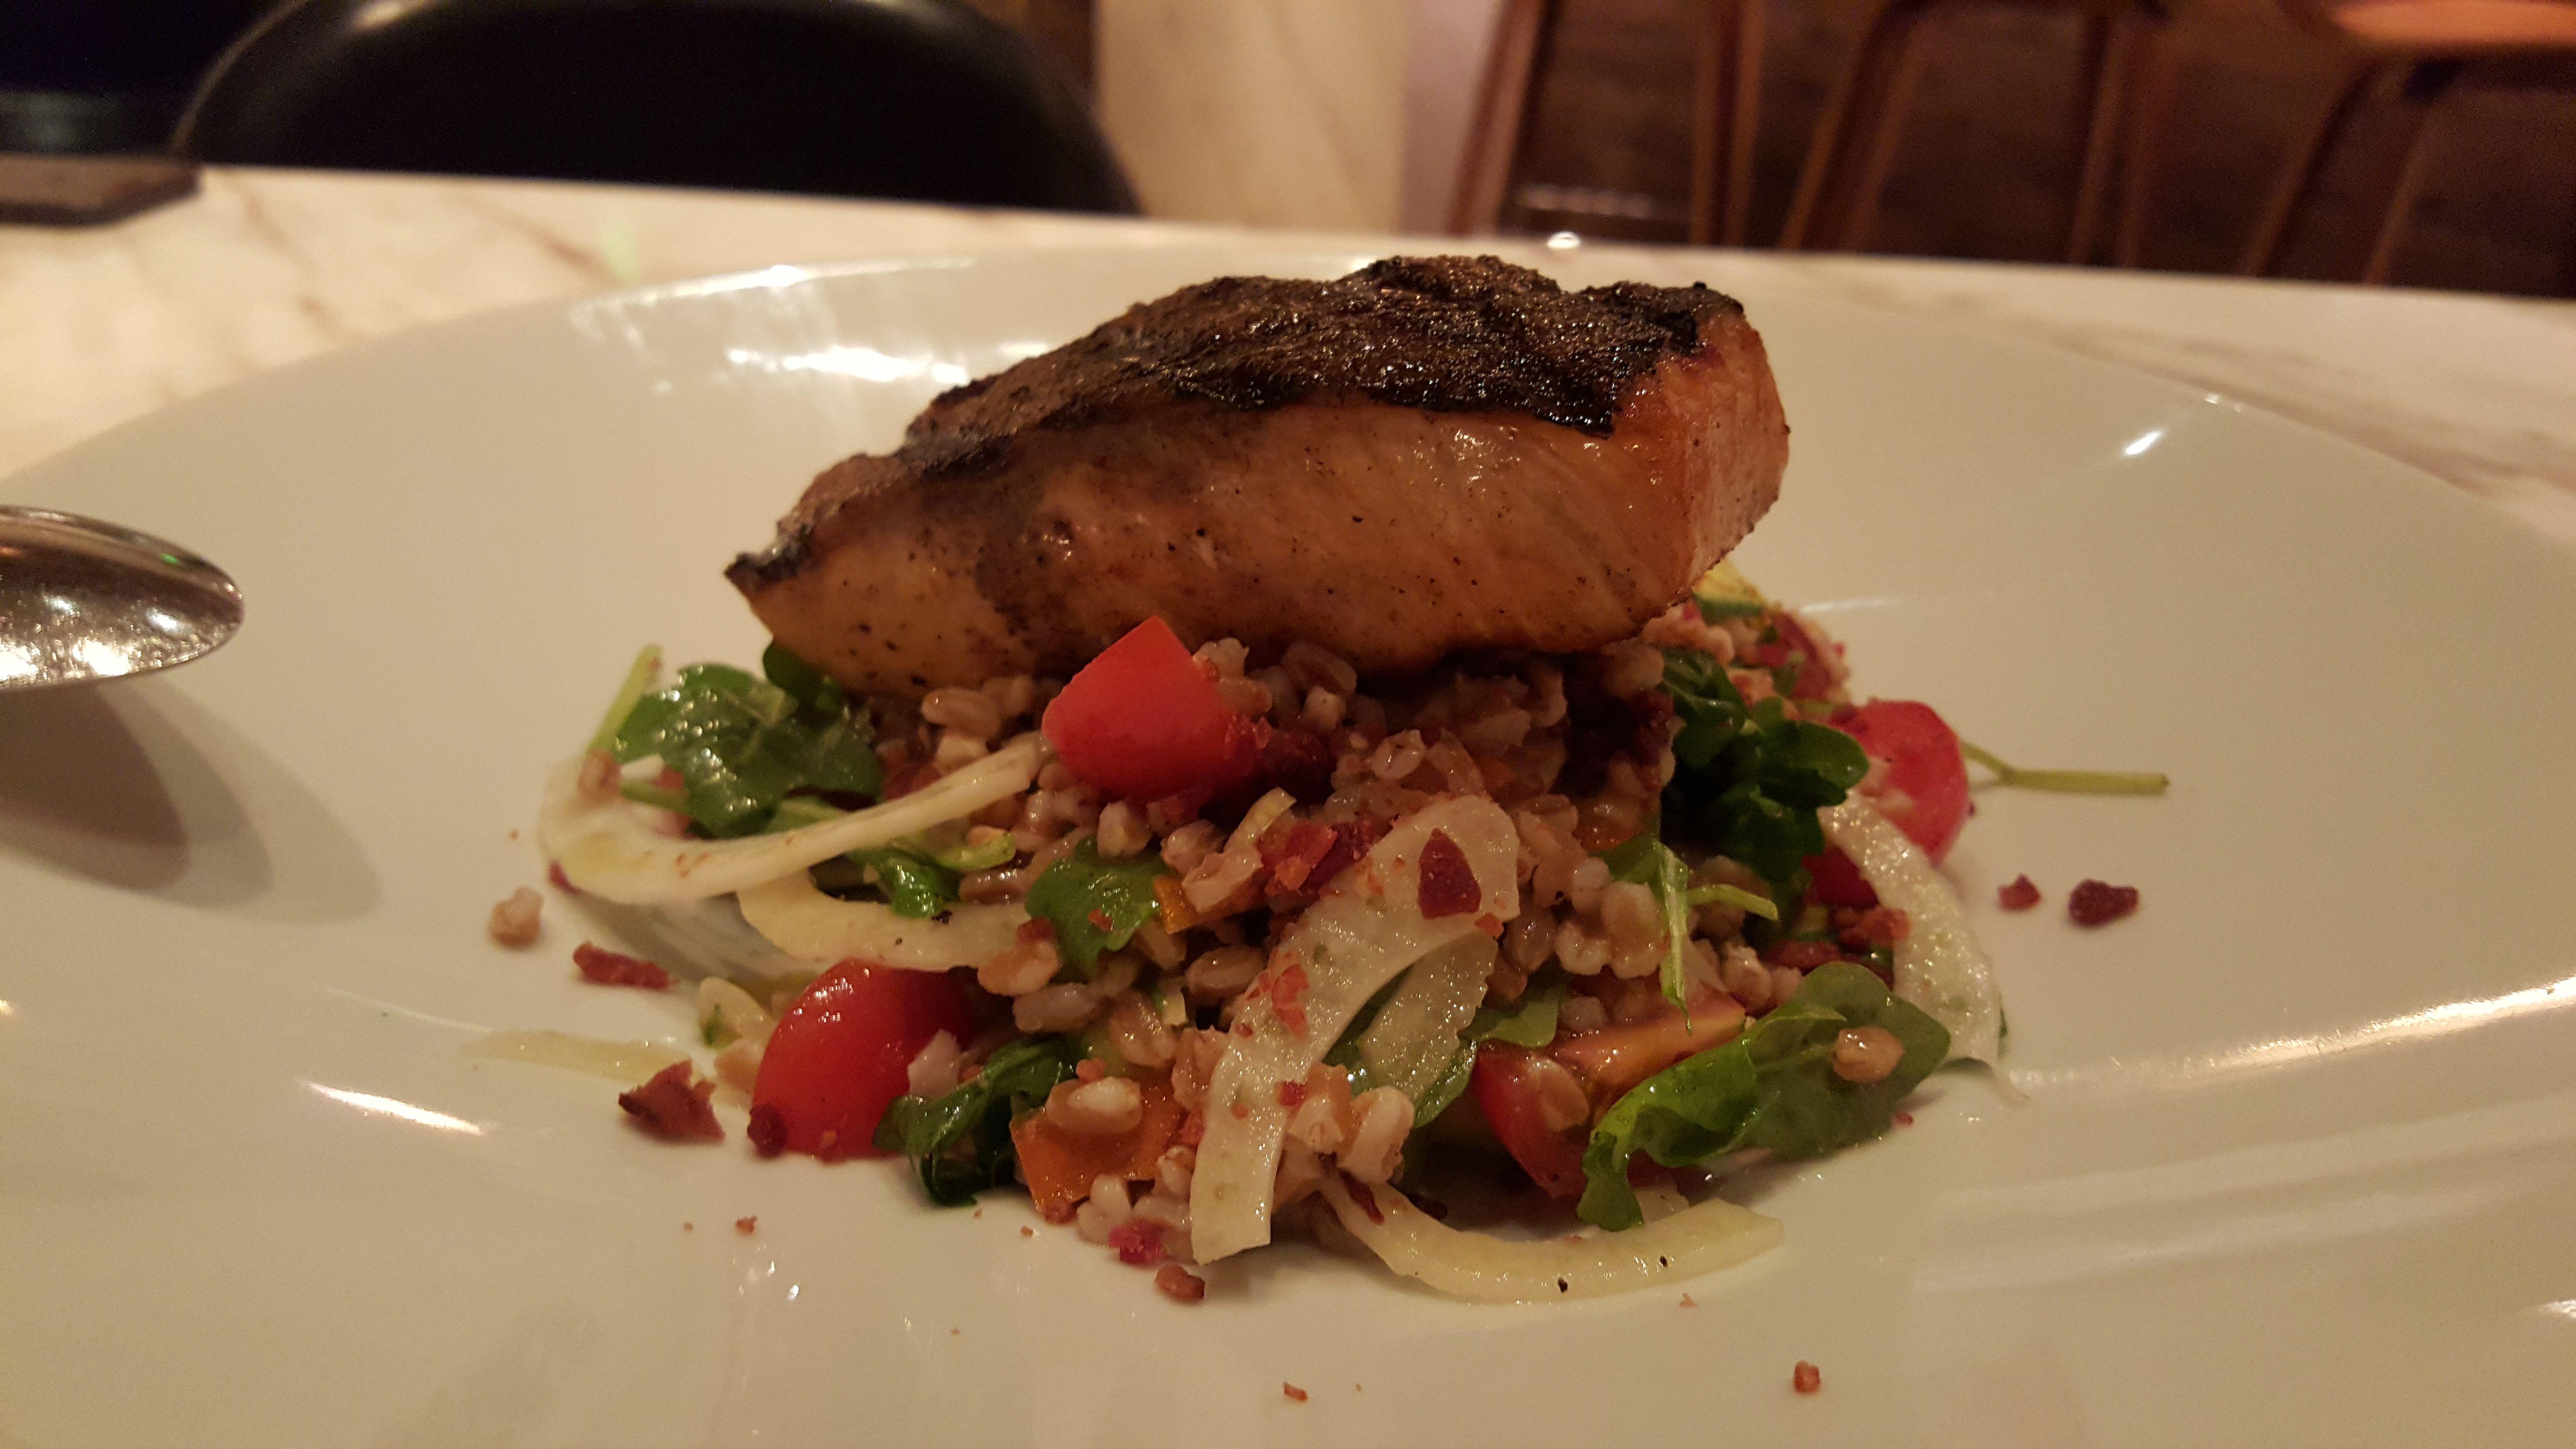 Salmon at D.O.C.G. at Cosmopolitan Las Vegas